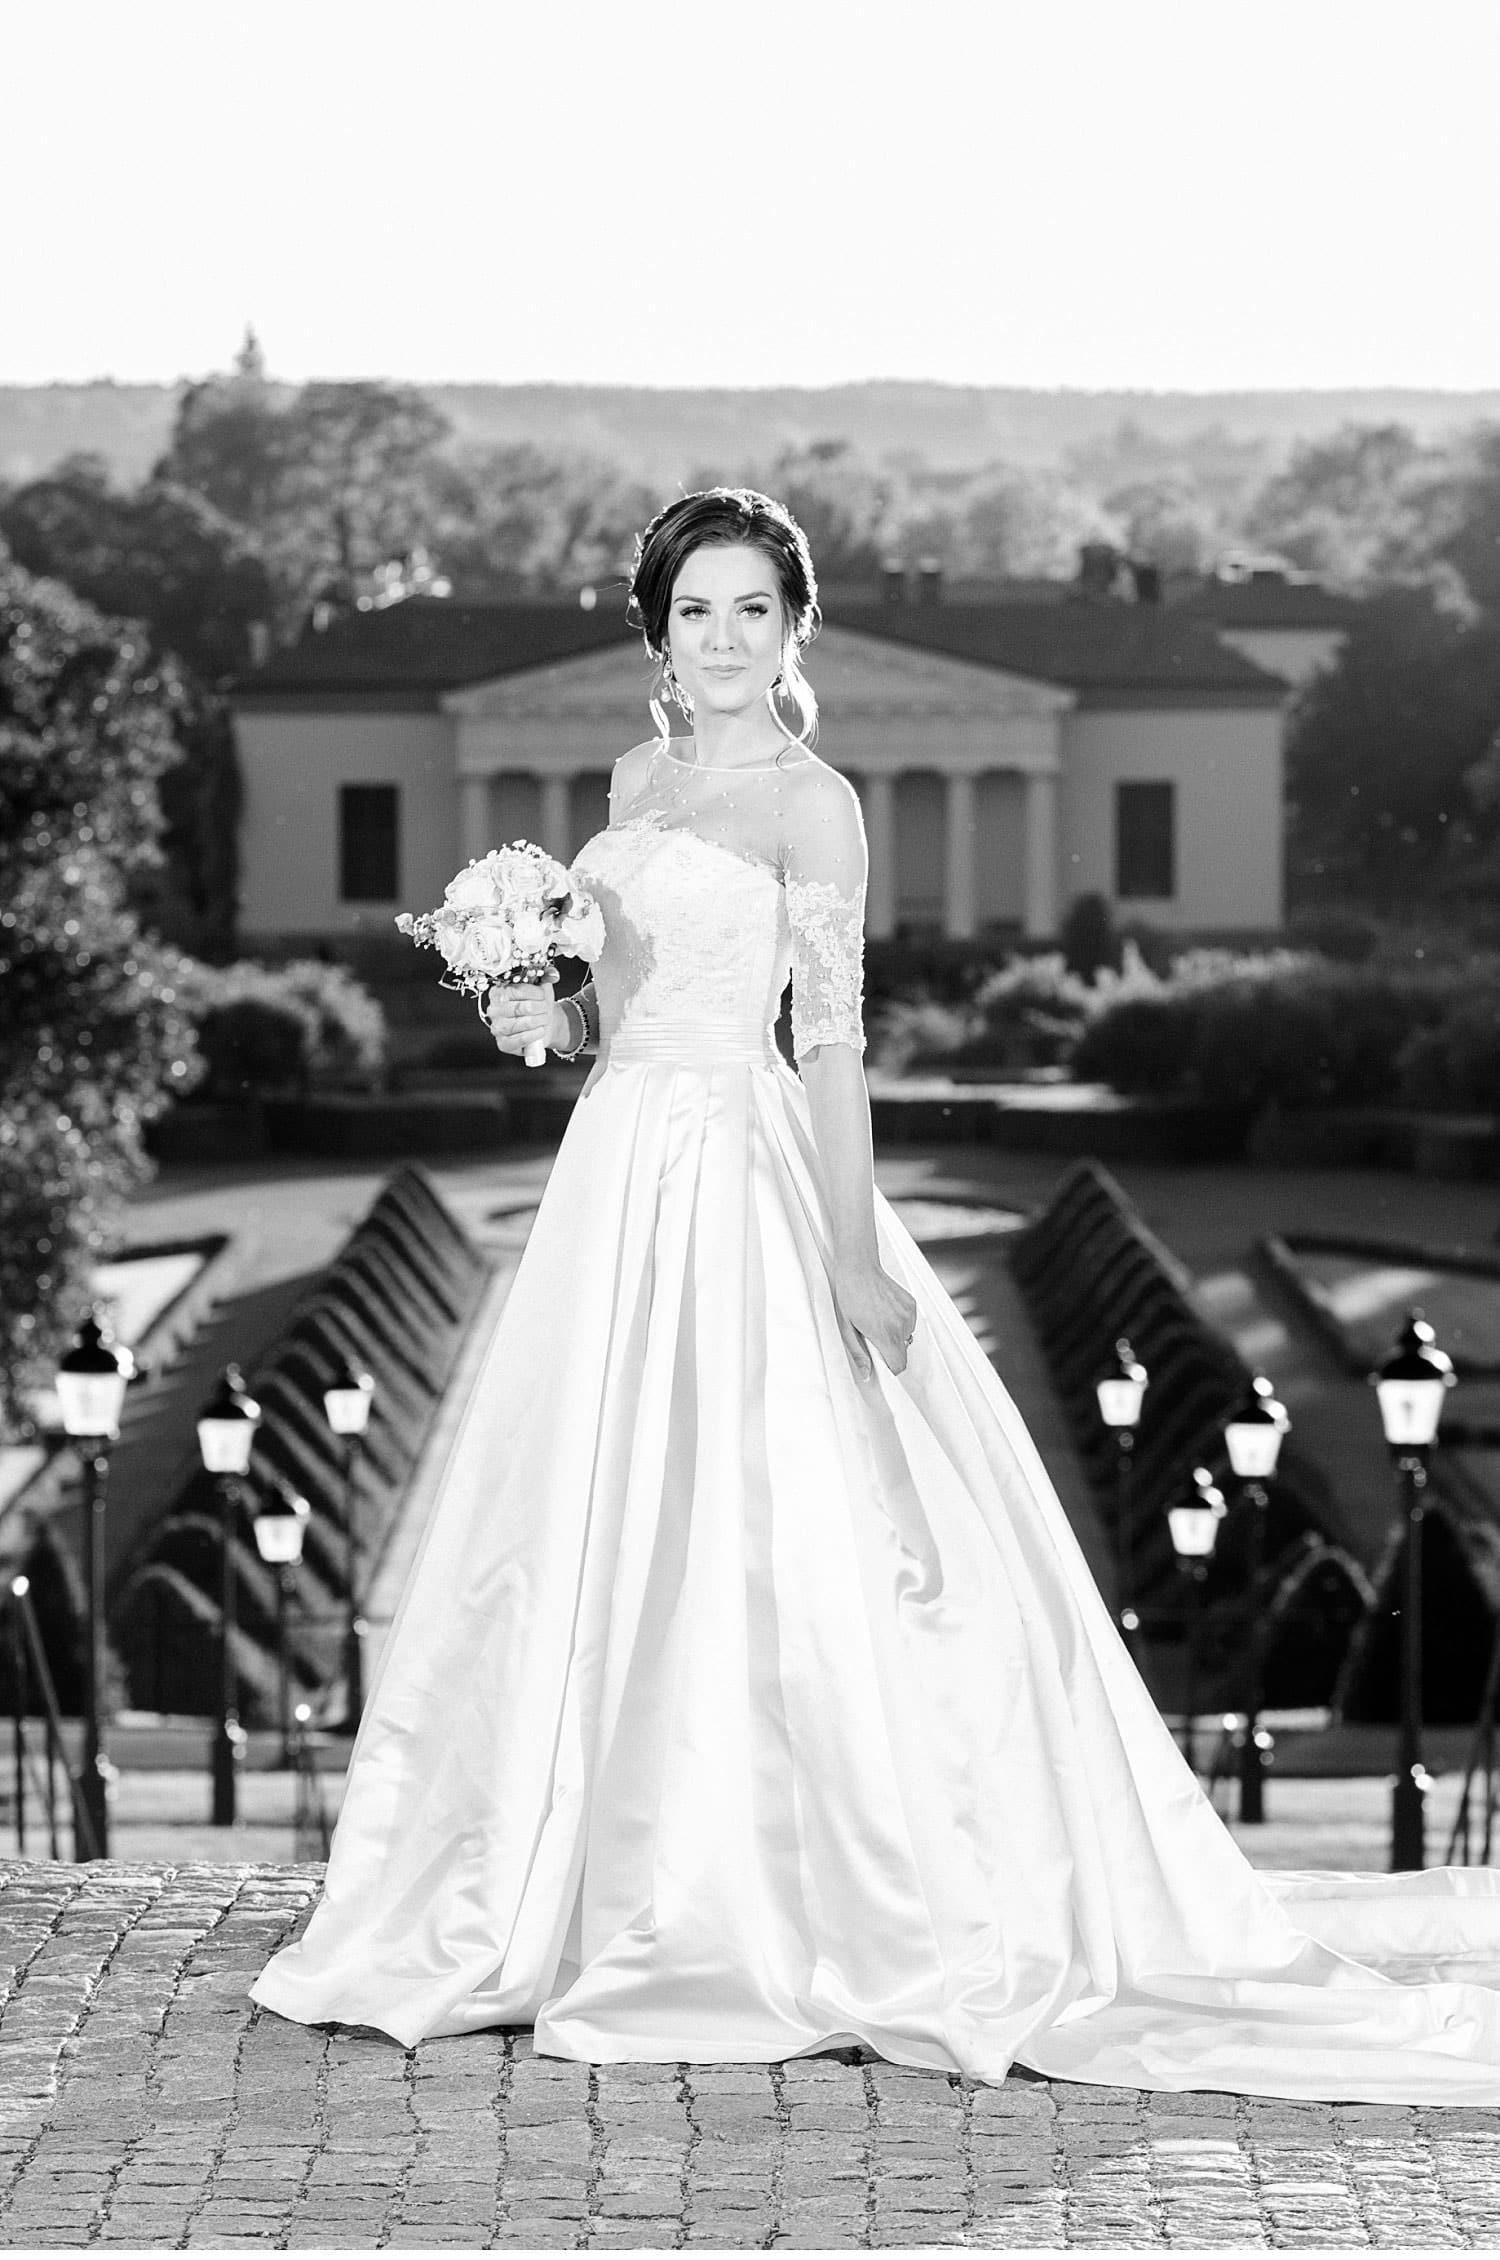 alina tom uppsala brollop kerrouphotography 439 1b - Alina & Tom wedding